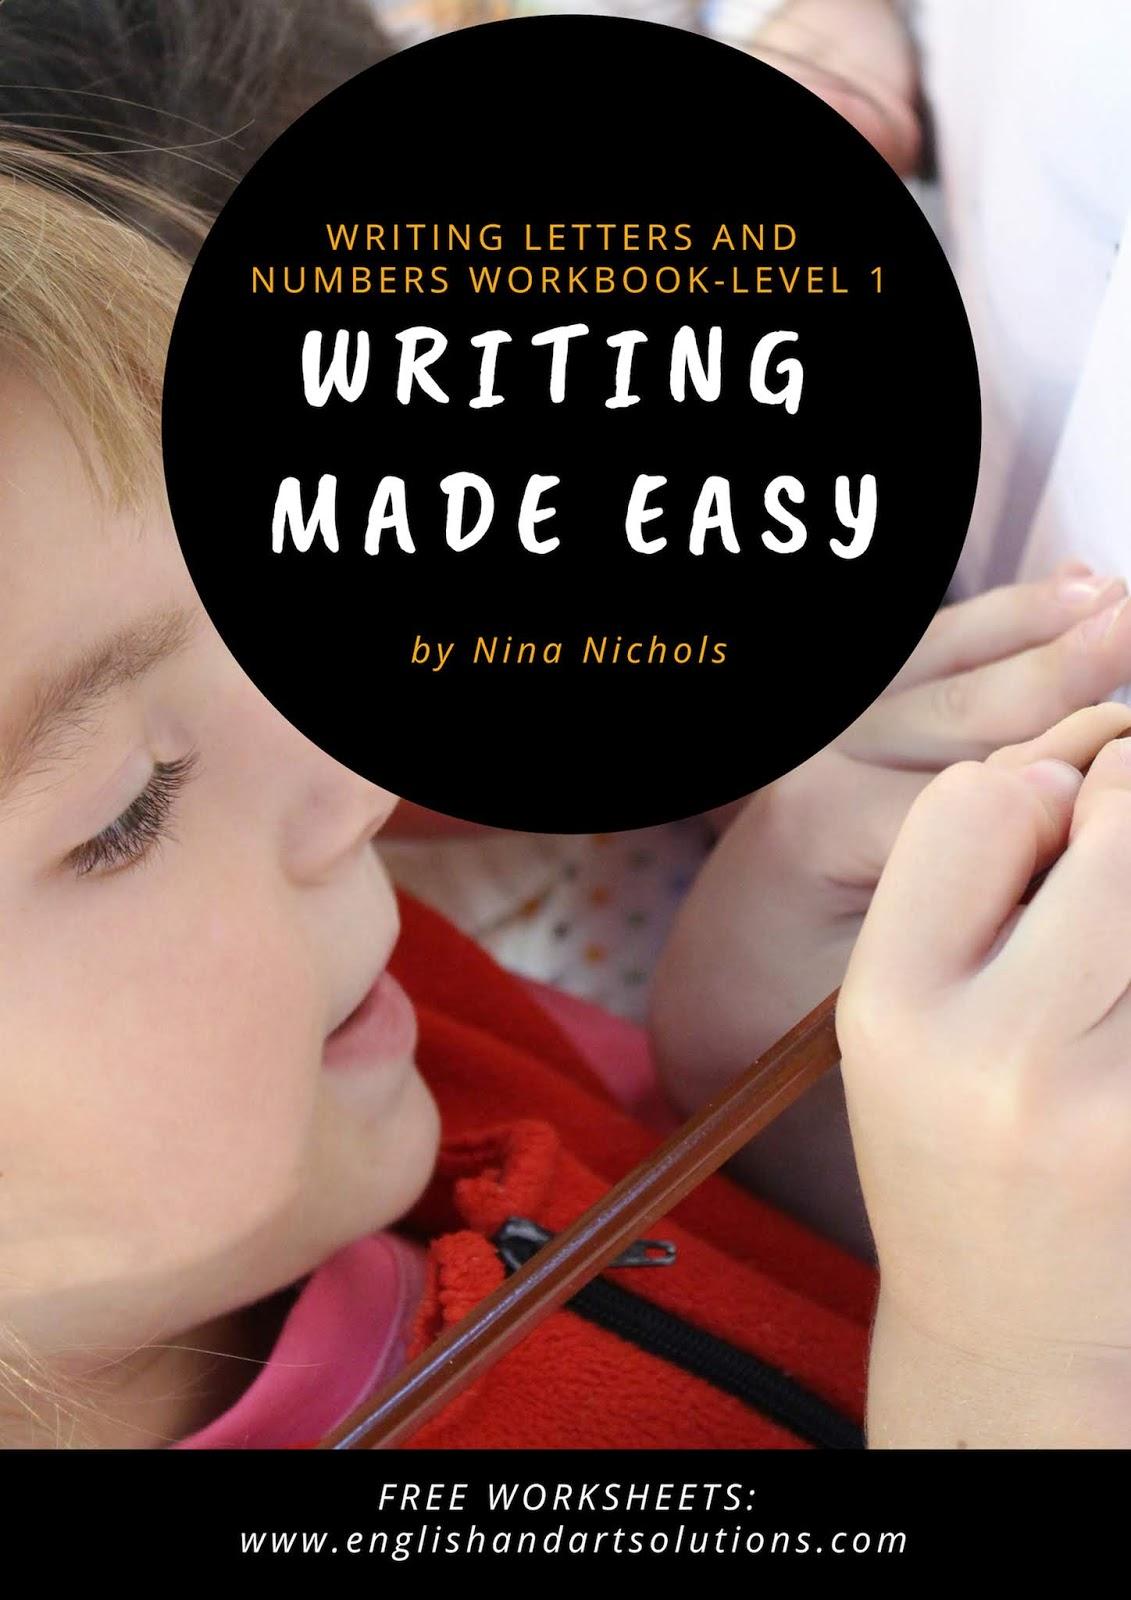 English And Art Solutions Ebooks Workbooks